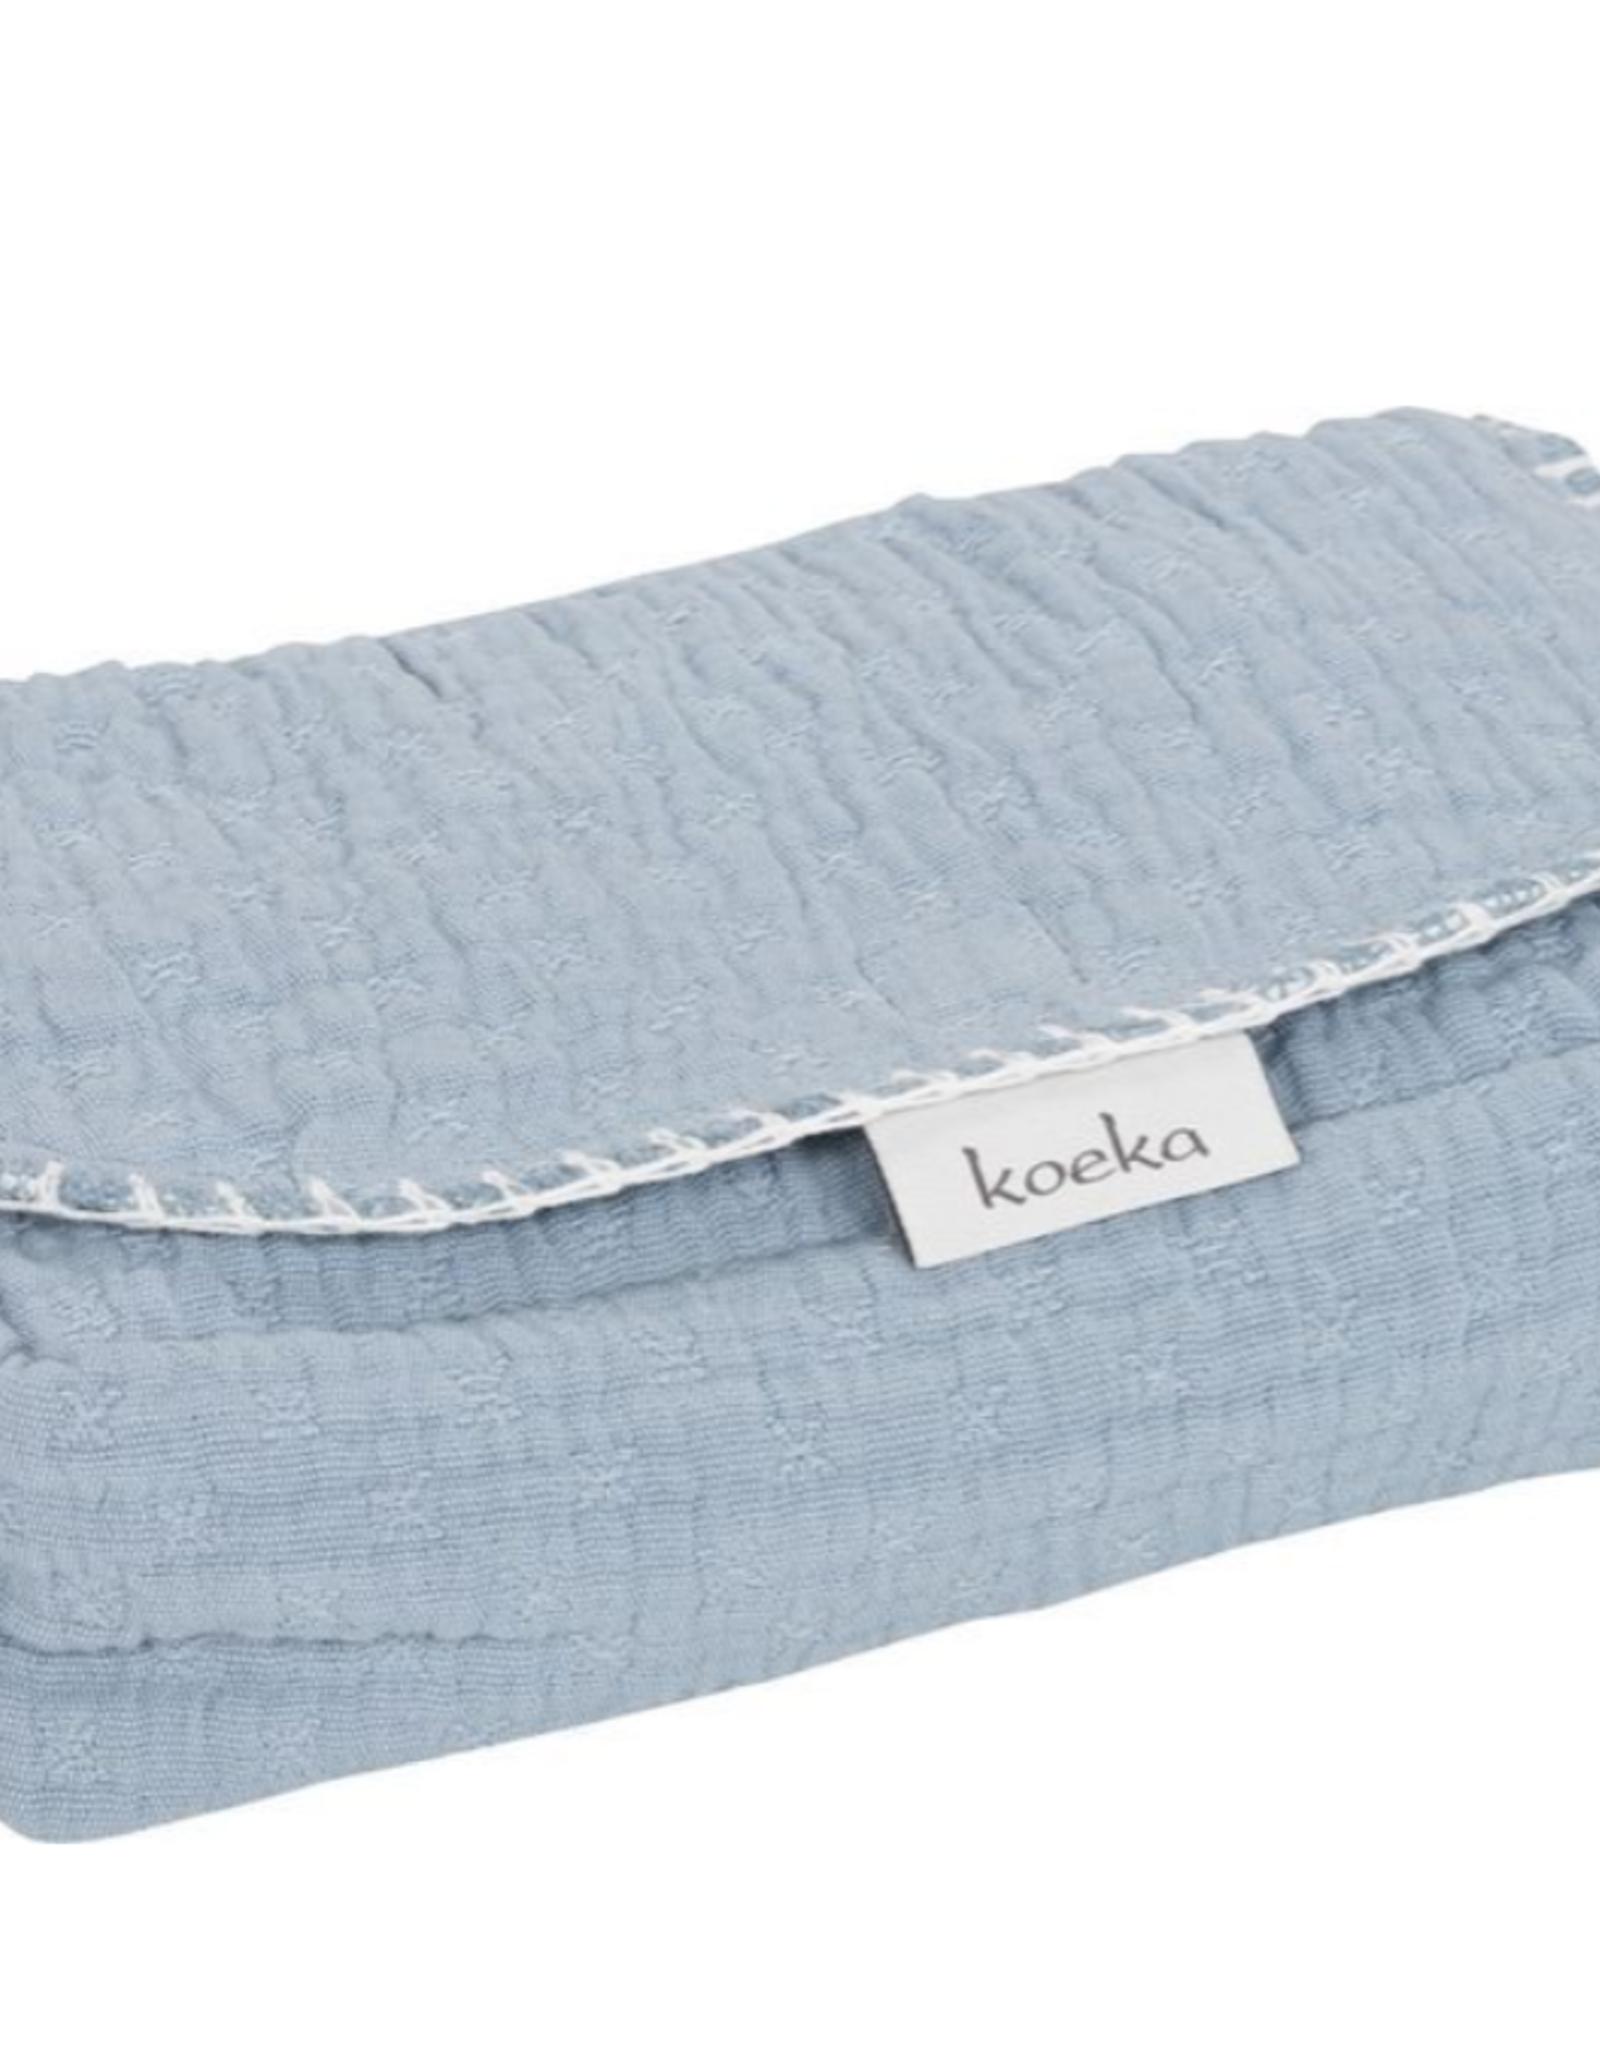 Koeka Koeka Hoes voor Babydoekjes Elba Soft Blue